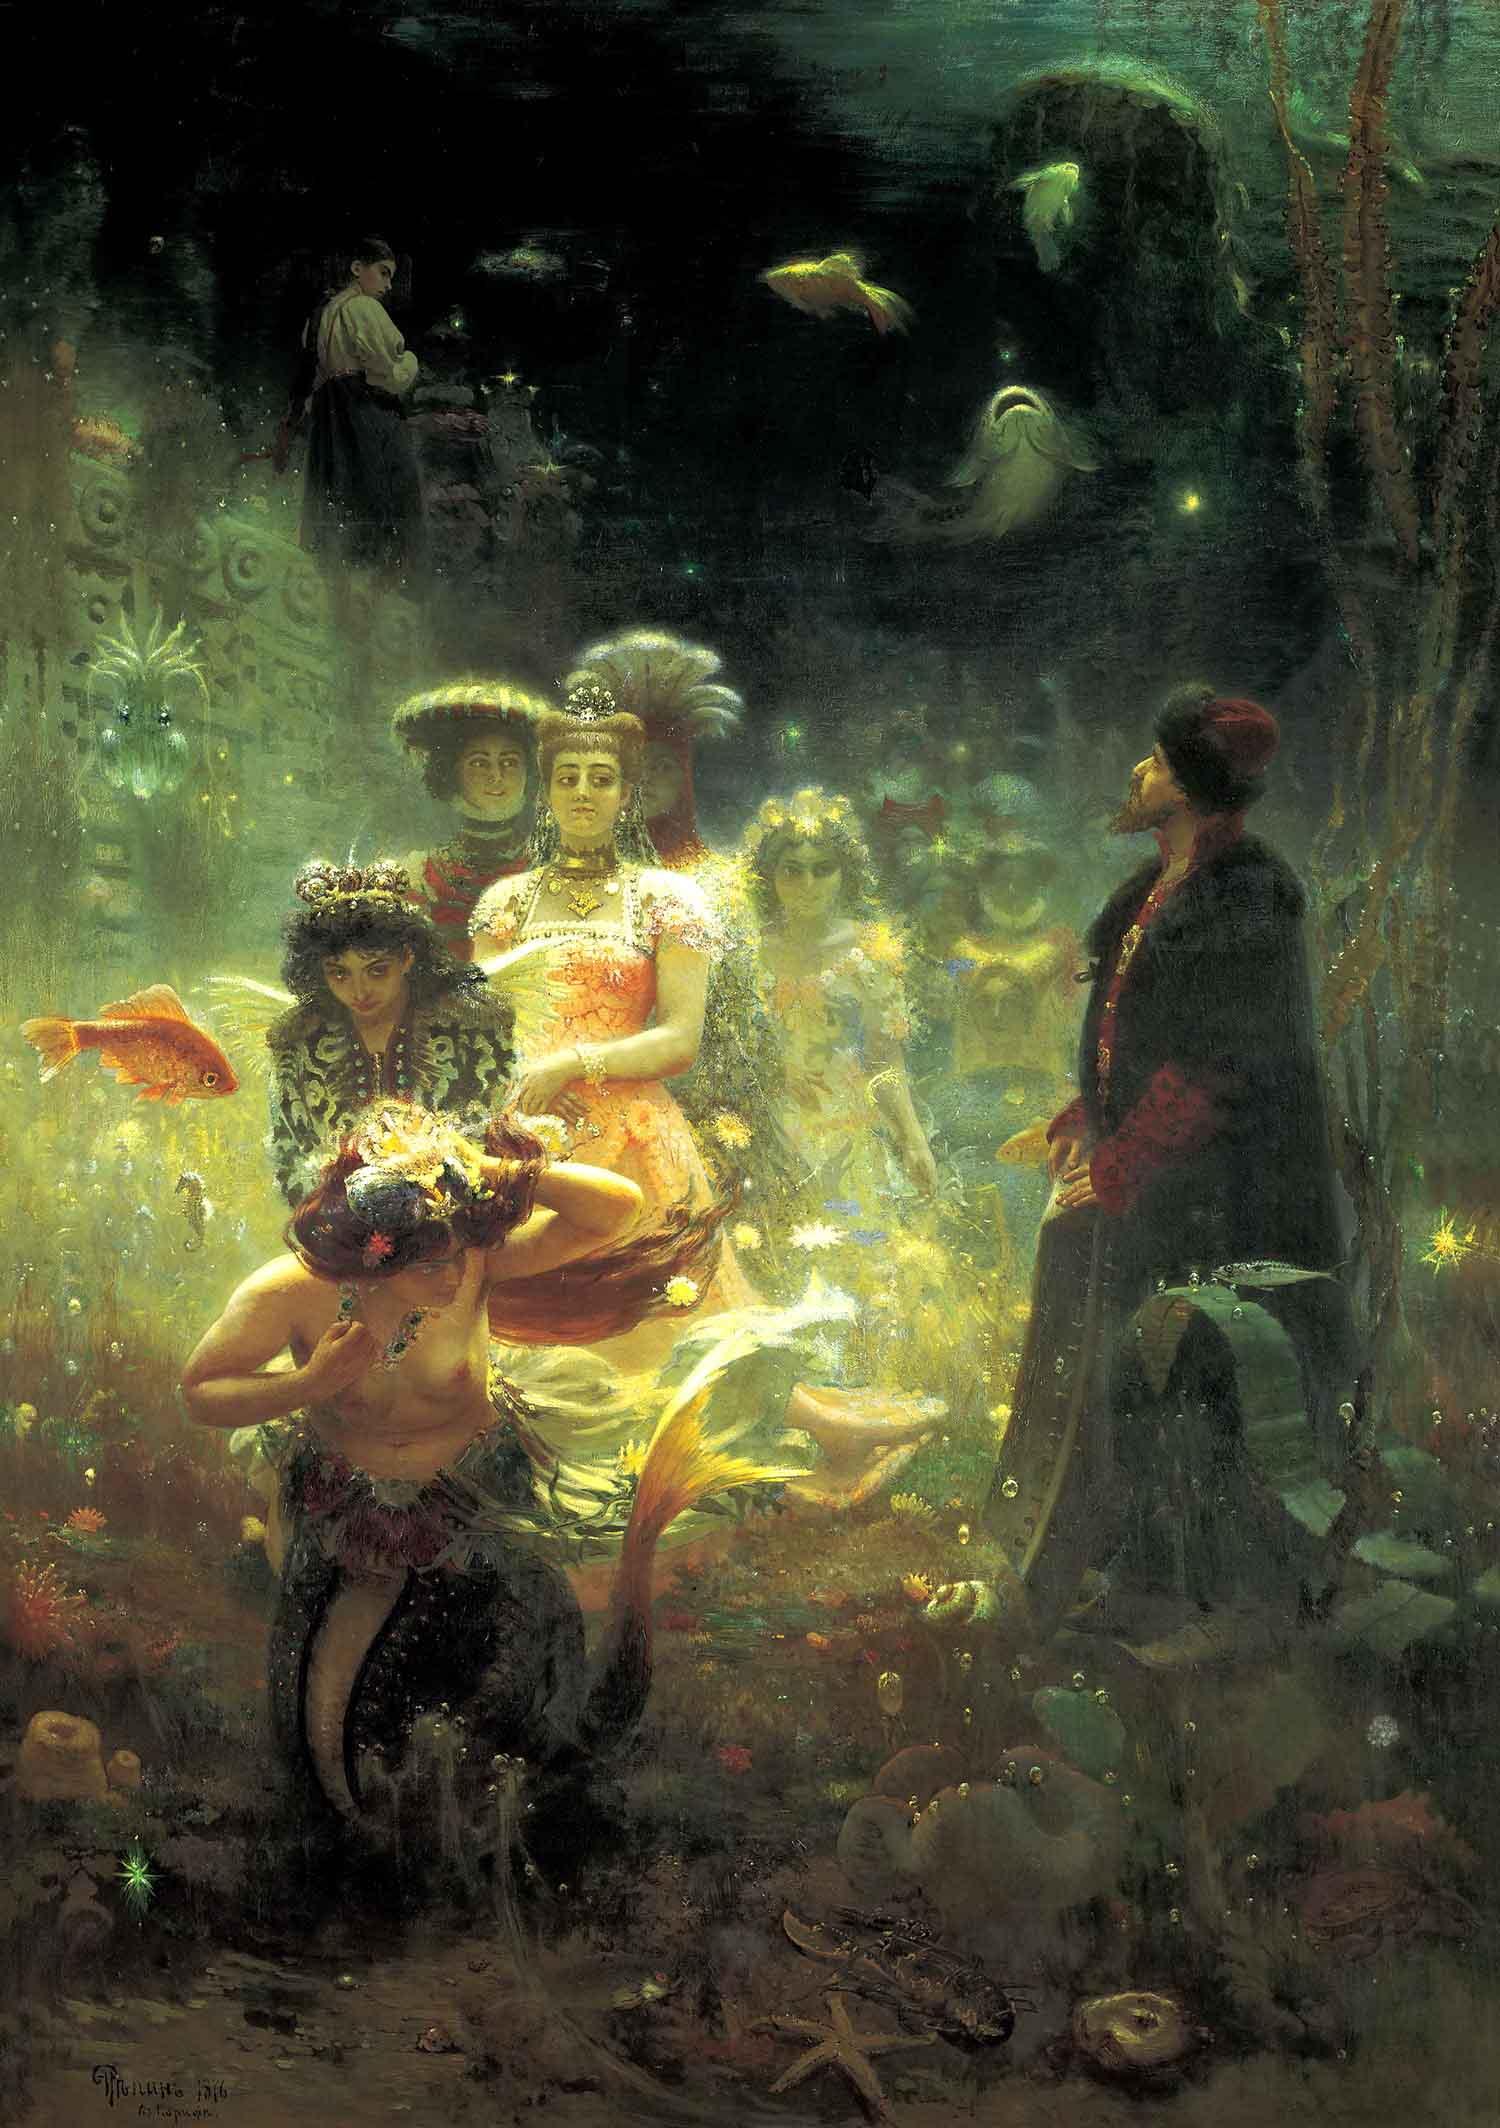 Илья Репин (Ilya Repin), Садко